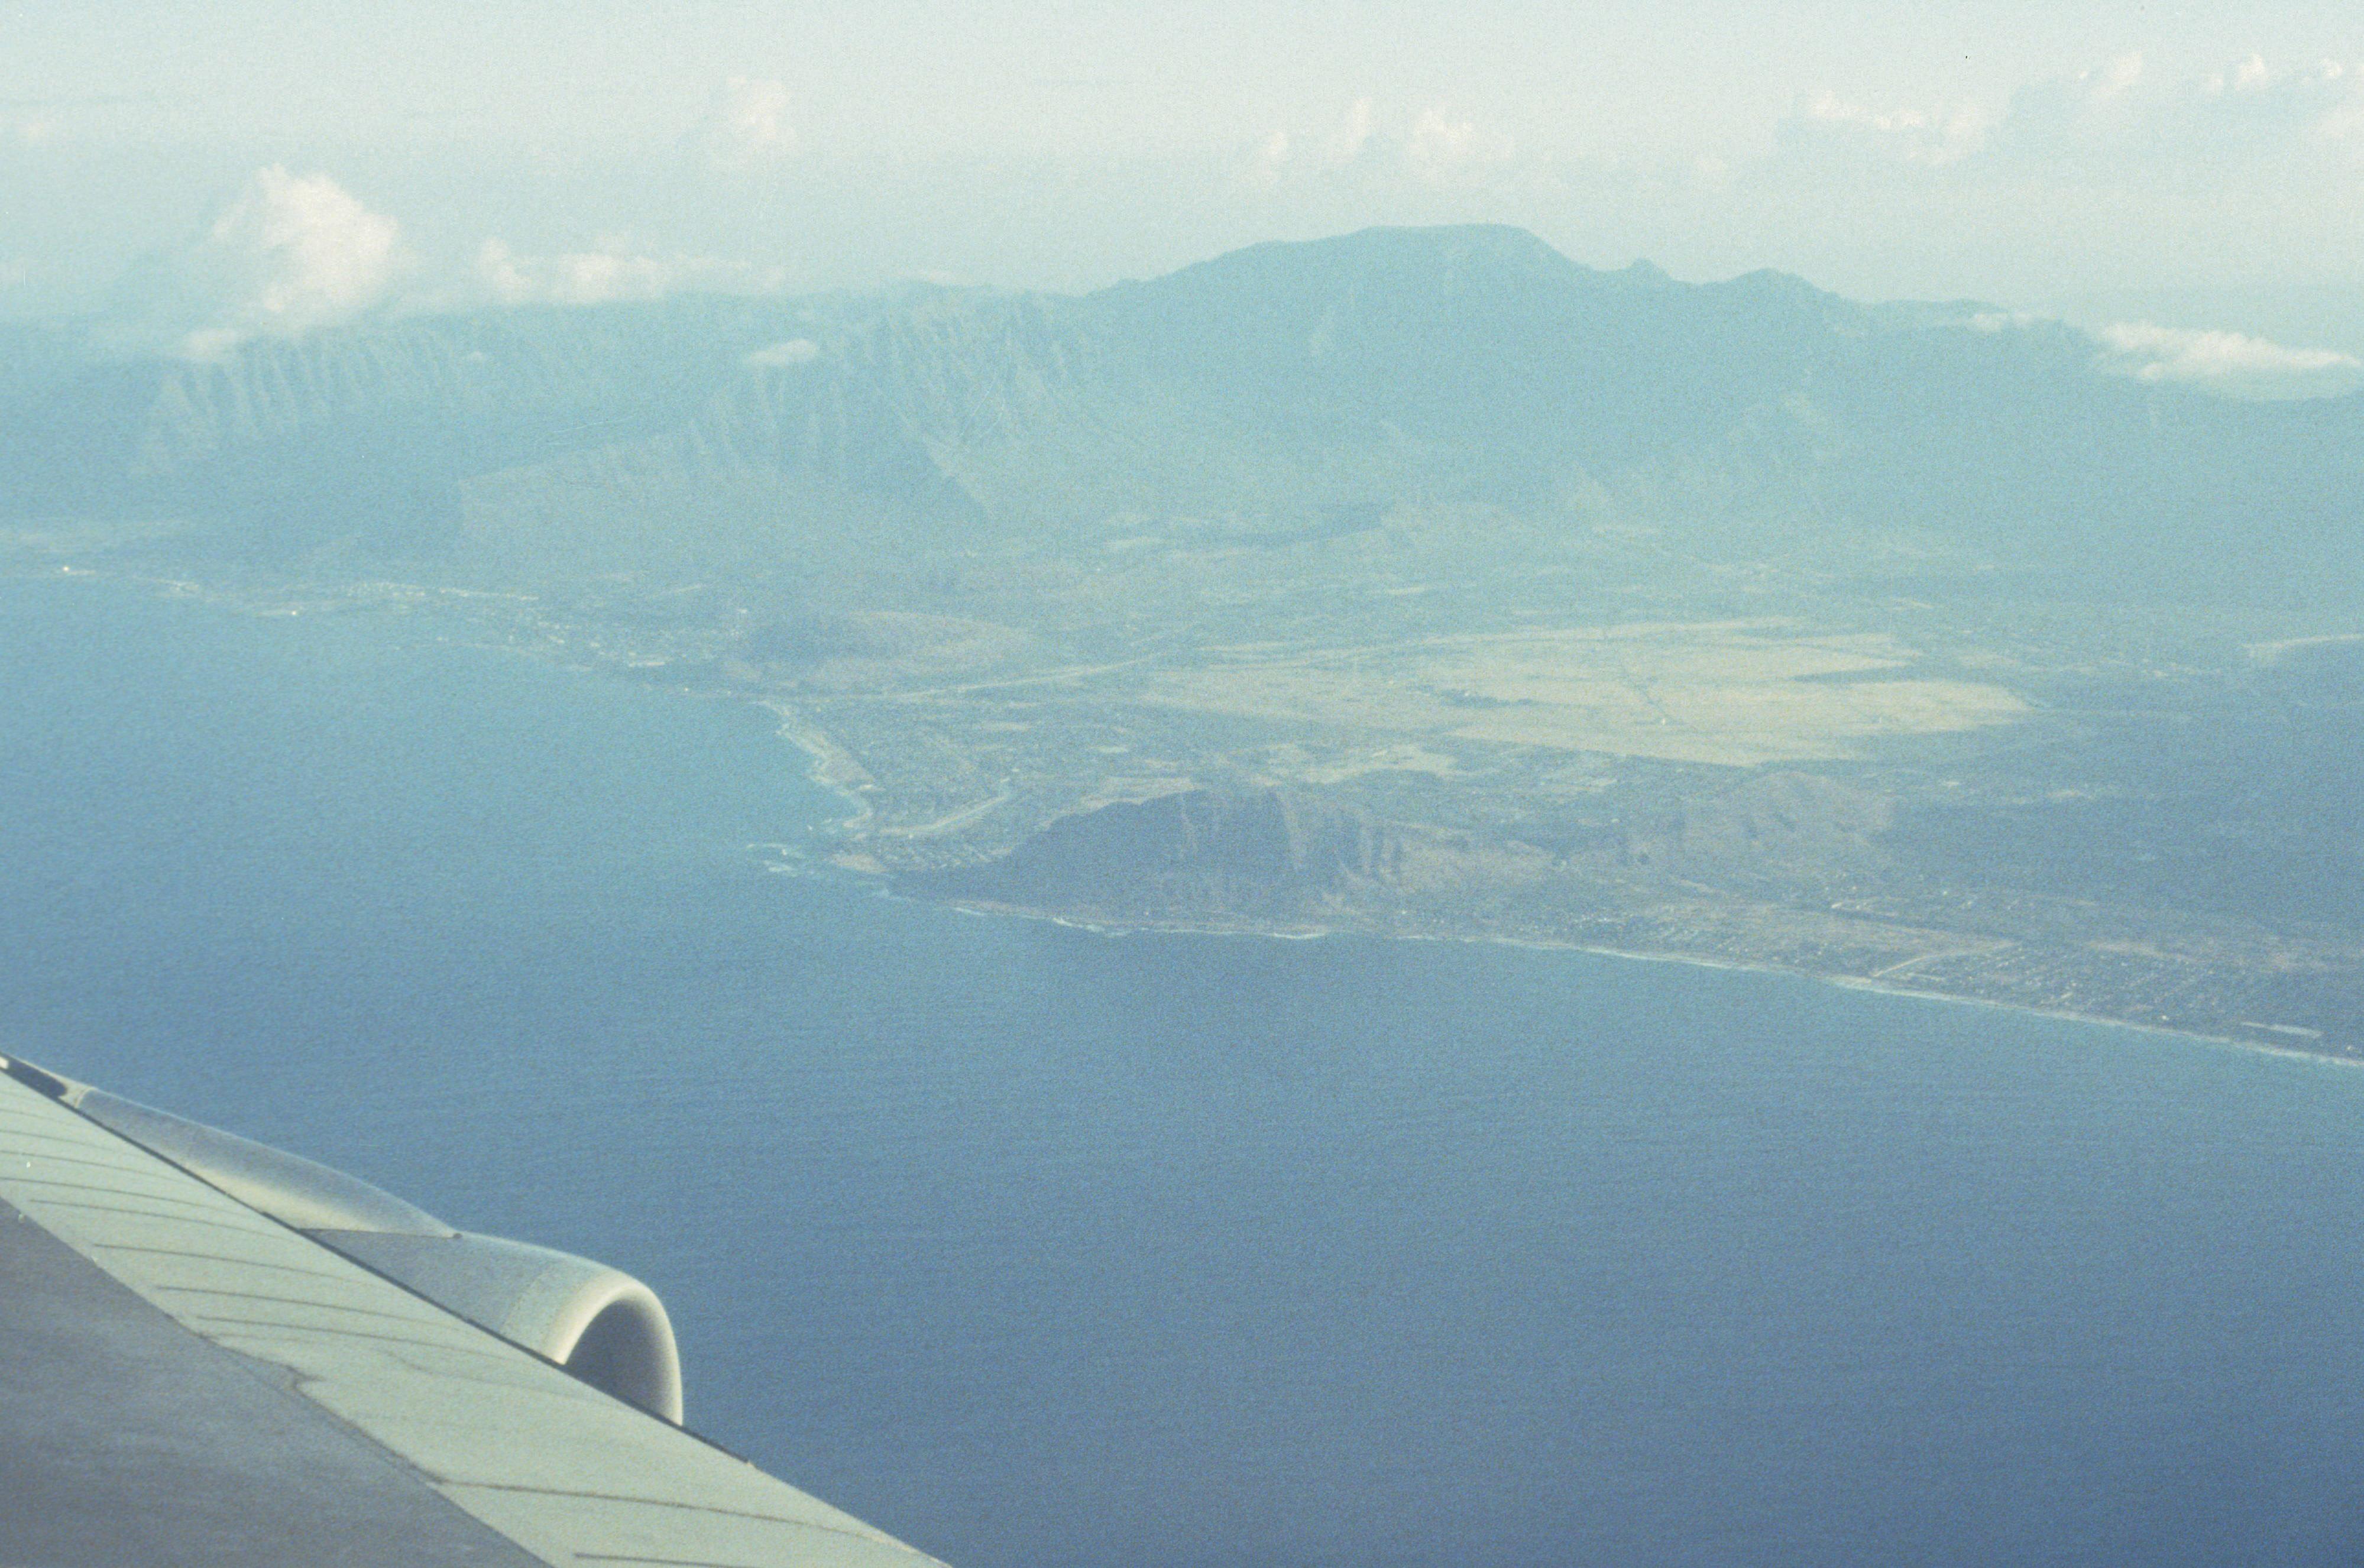 39.120 3-7-81 Hawaii Approaching Oahu_edited-1